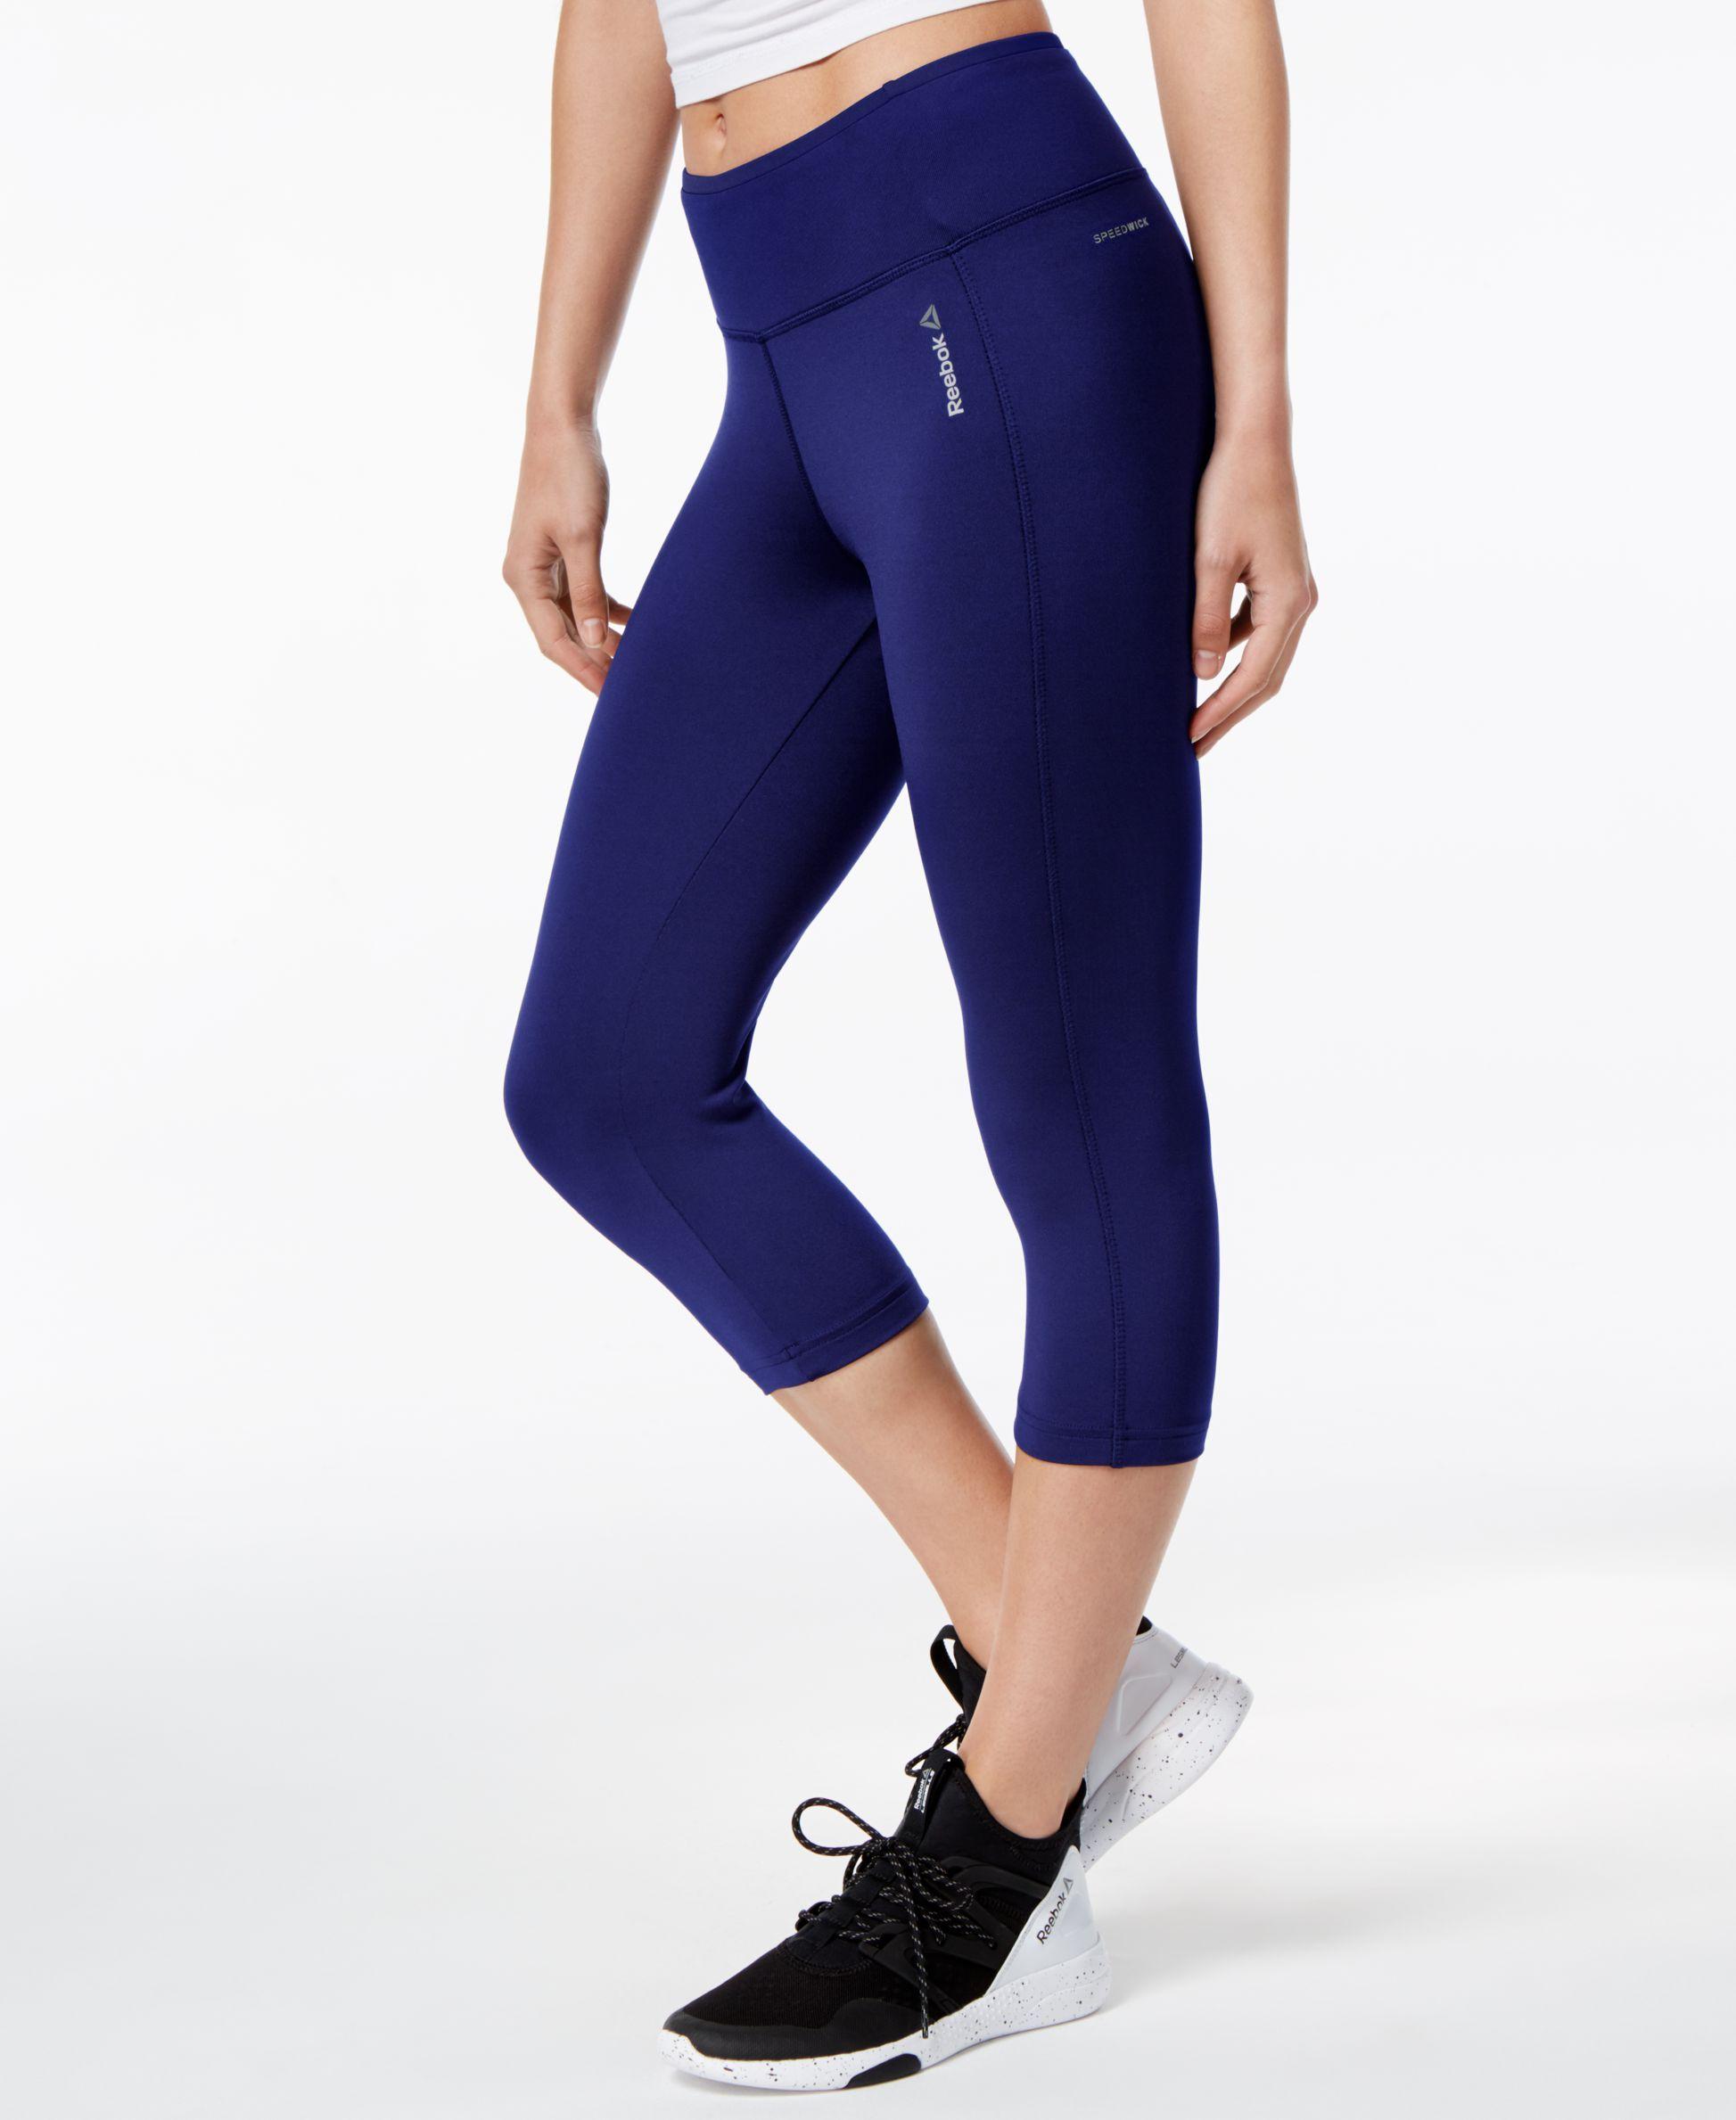 d02c54c821 Reebok Speedwick Capri Leggings   Products   Capri leggings, White ...